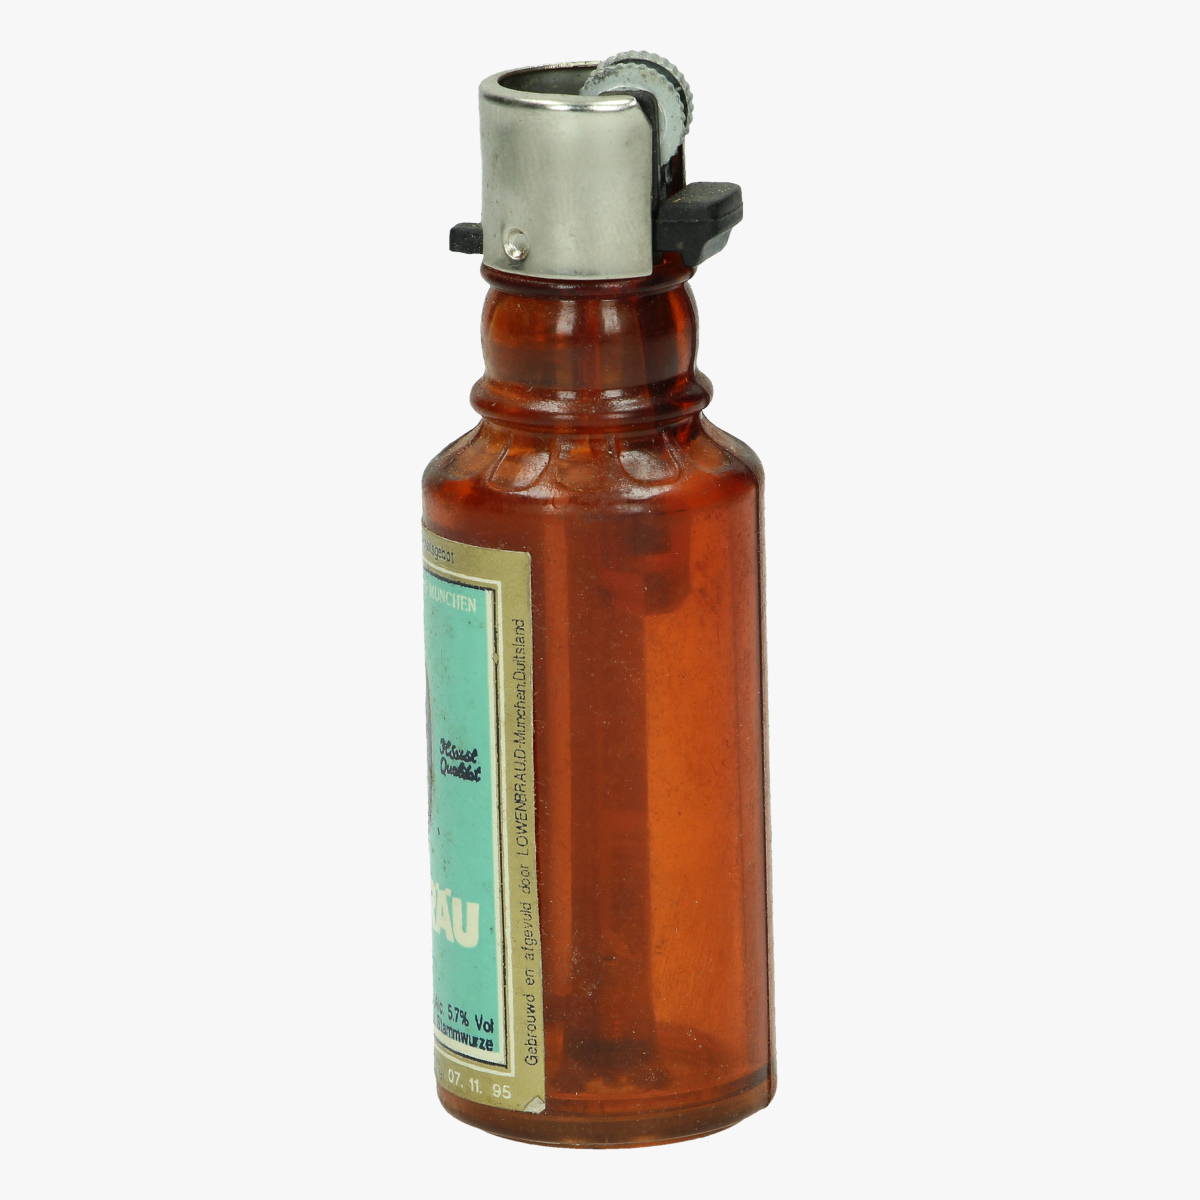 Afbeeldingen van aansteker flesje lowenbrau navulbaar